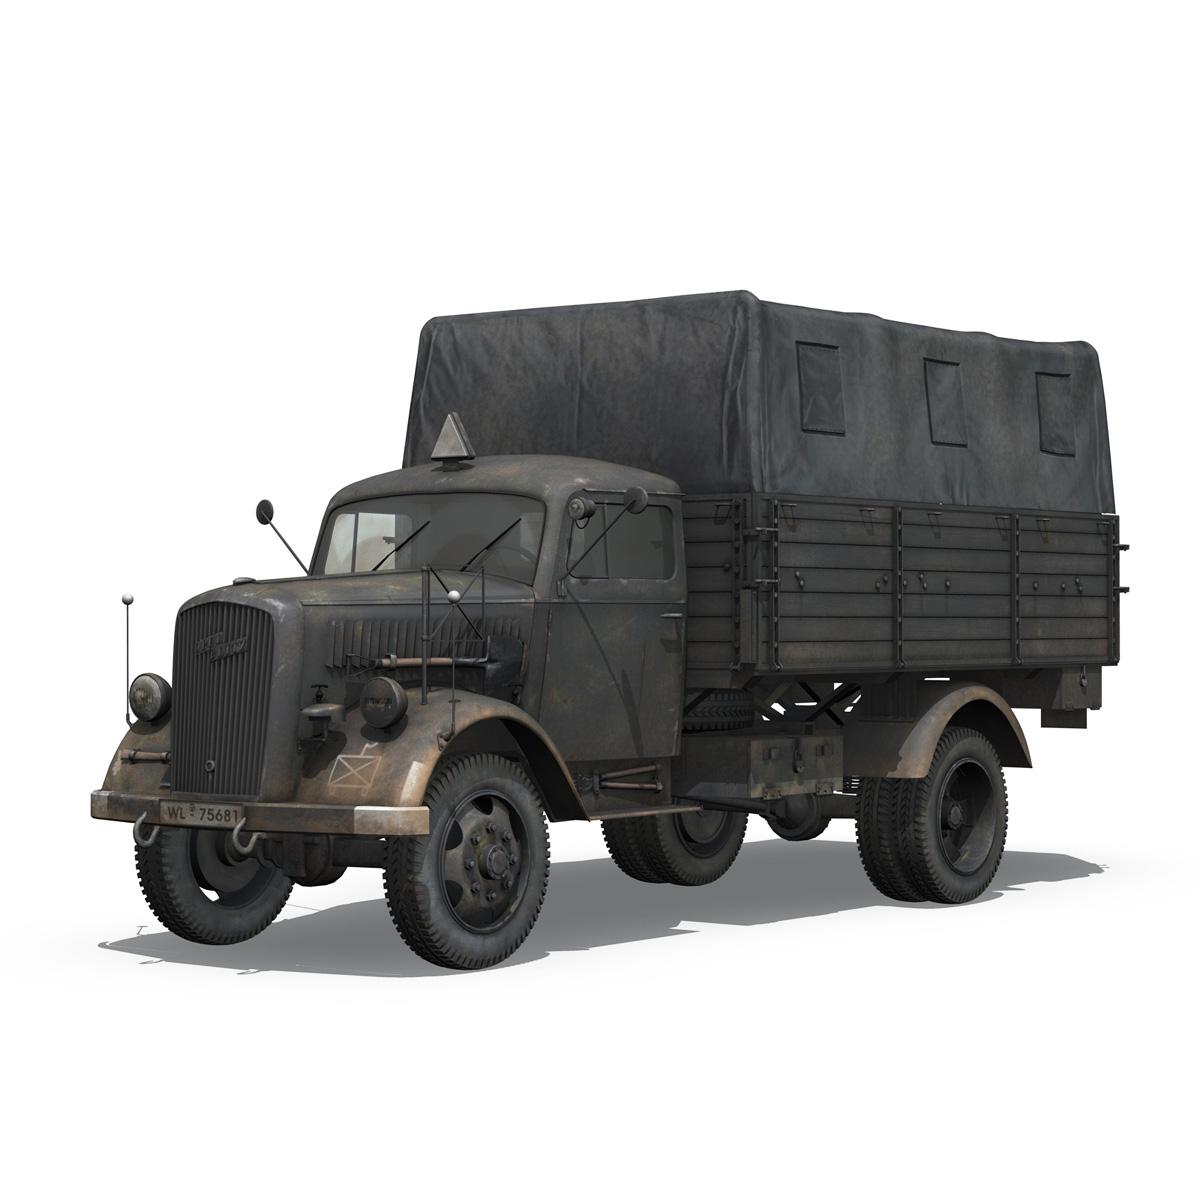 blitz opel - lori cargo 3t - 17 pzdiv model 3d 3ds fbx c4d lwo obj 197197